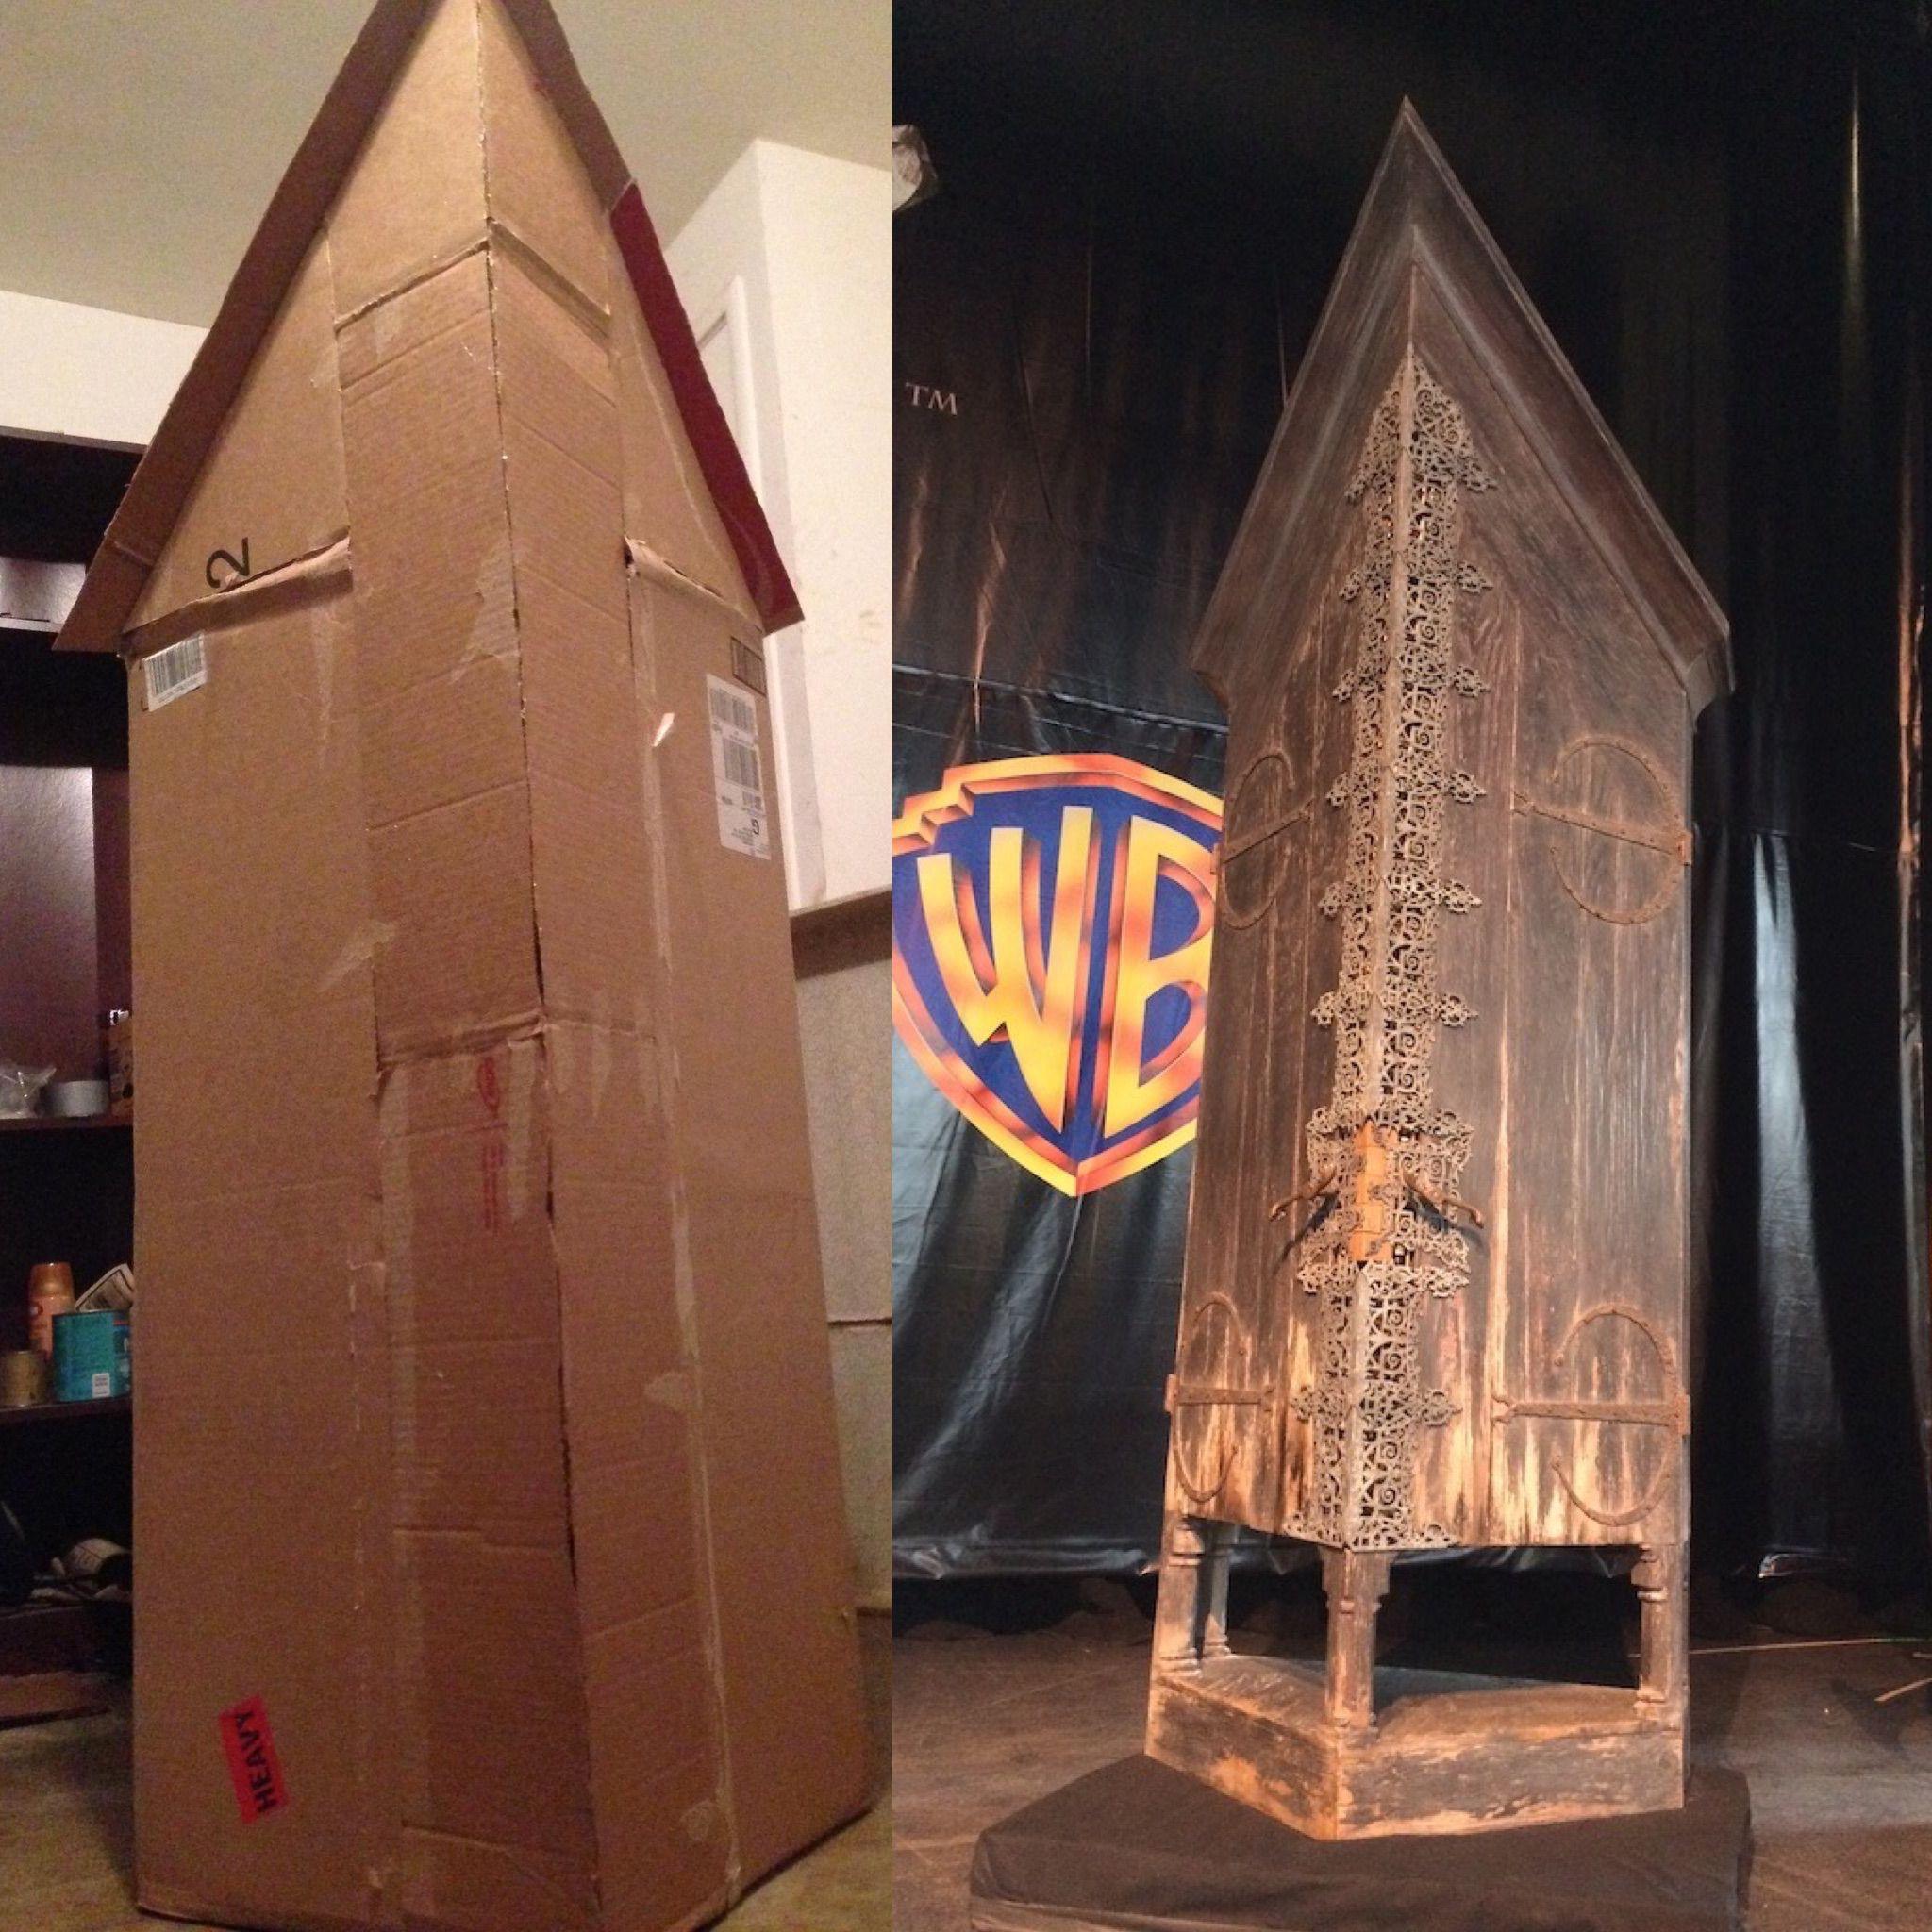 Diy Harry Potter Vanishing Cabinet For An Hp Halloween #Harrypotter